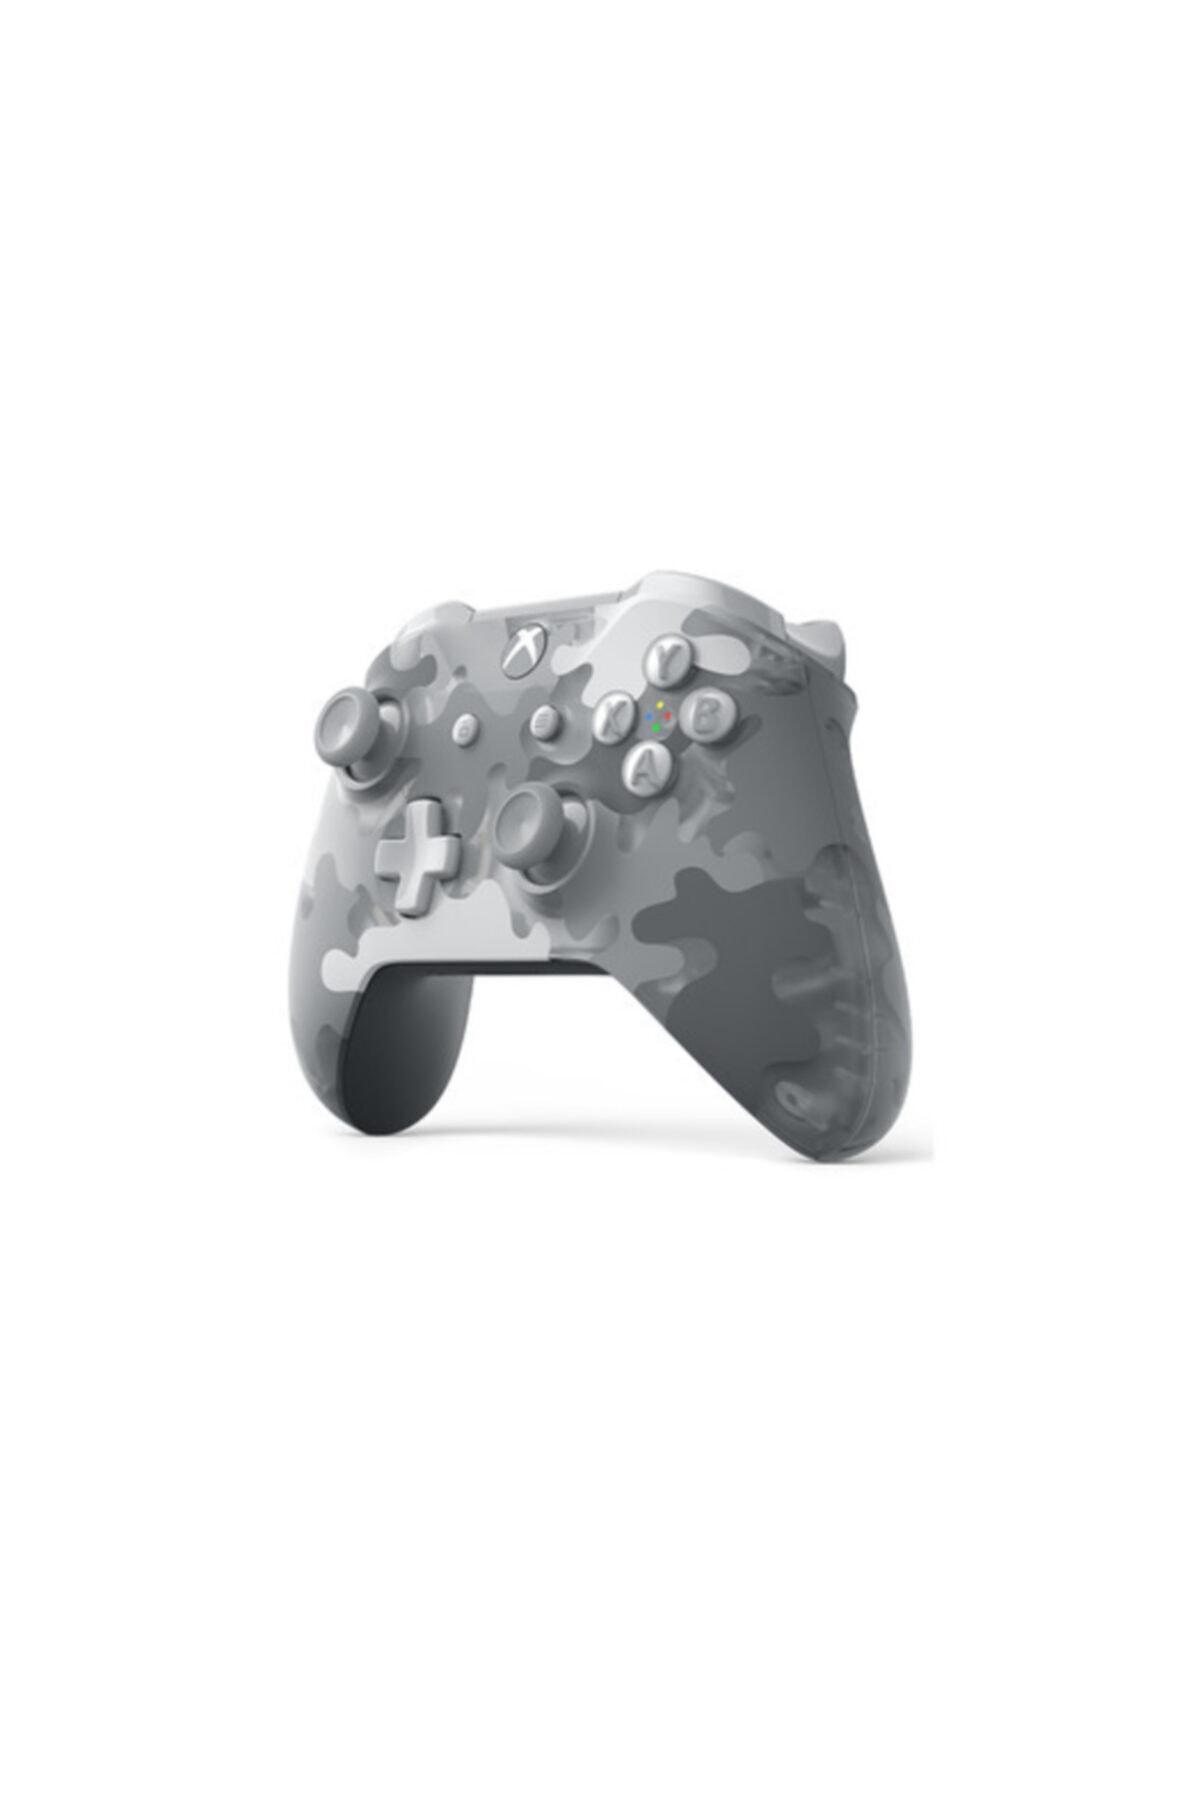 MICROSOFT Xbox One Arctic Camo Special Edition Kablosuz Oyun Kumandası Wl3-00175 2